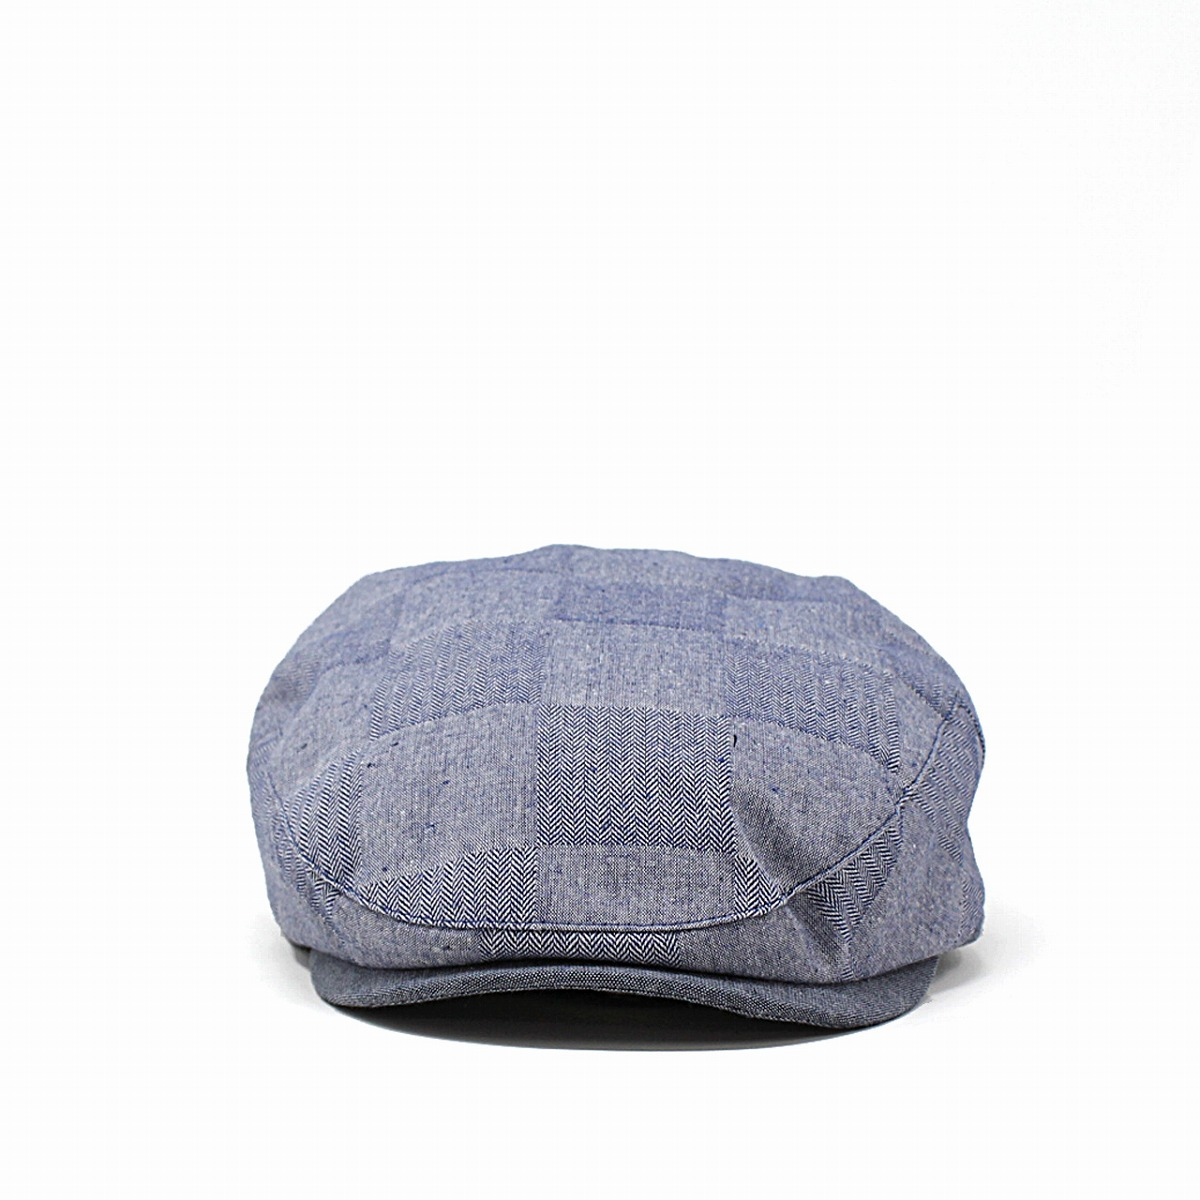 a5122aabbbe8d7 ... Herringbone checked pattern cotton 100 hunting cap block check stetson  men STETSON hat size grain Stetson ...